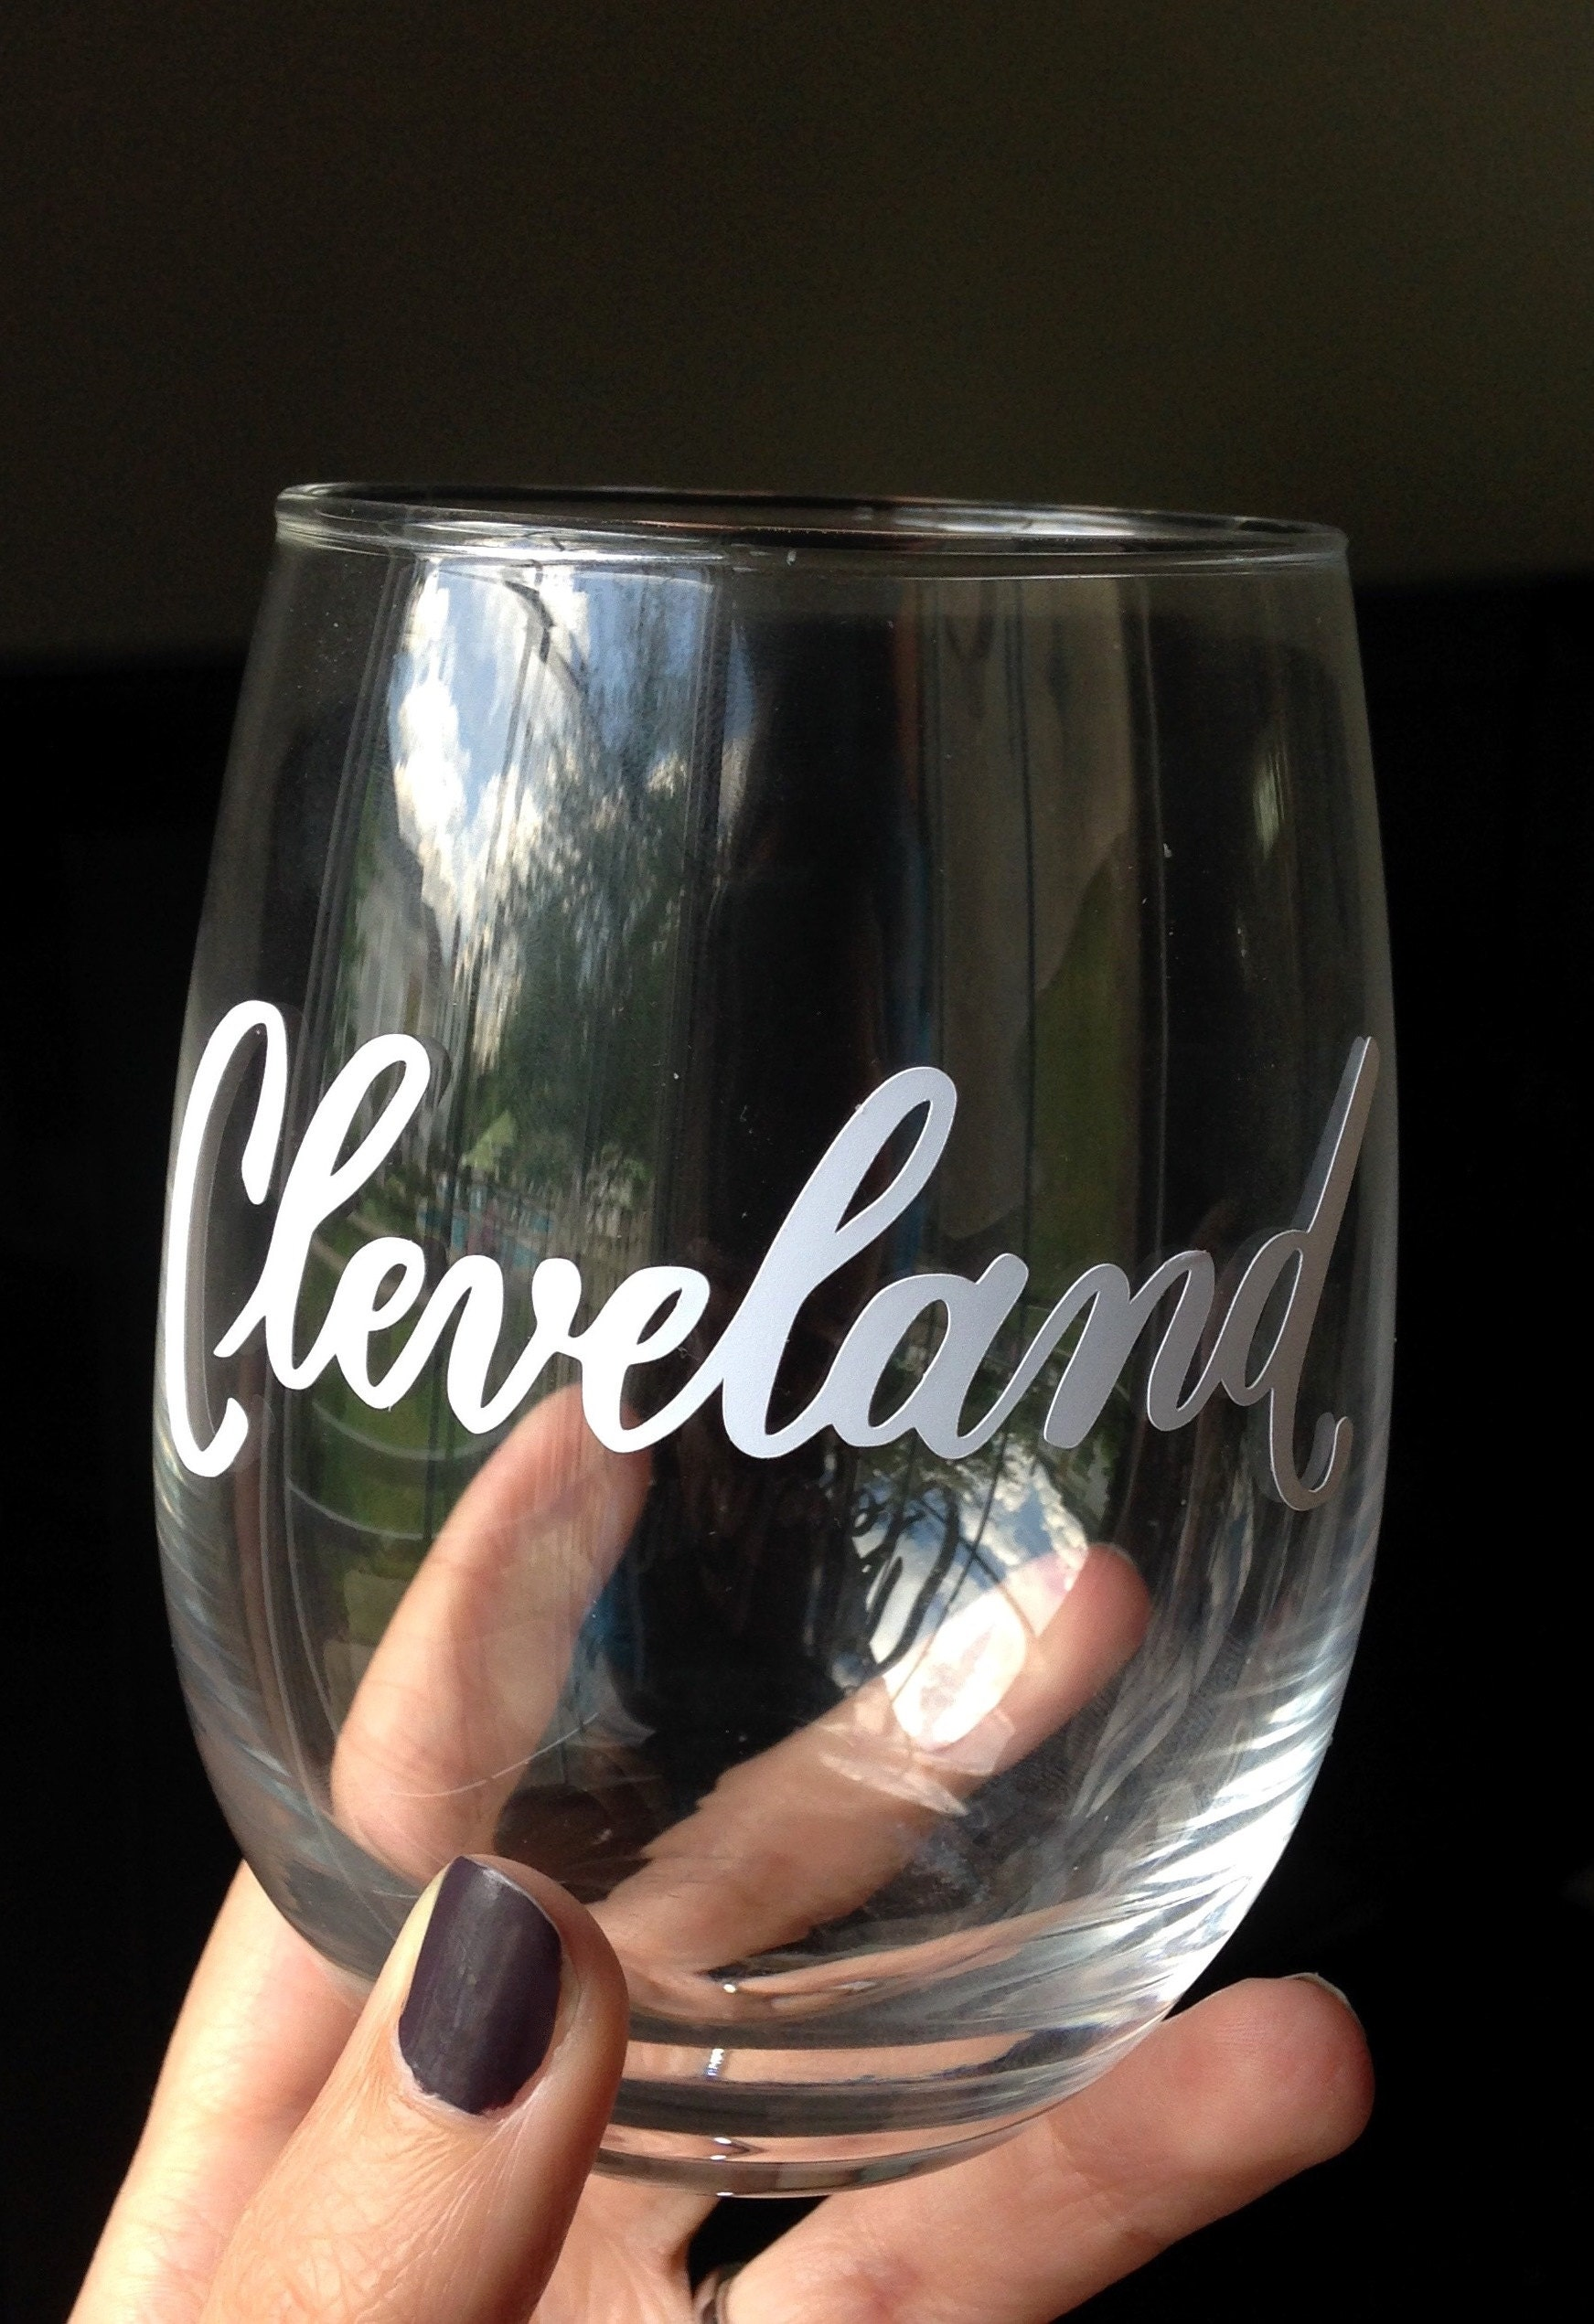 Finished vinyl lettered wine glass